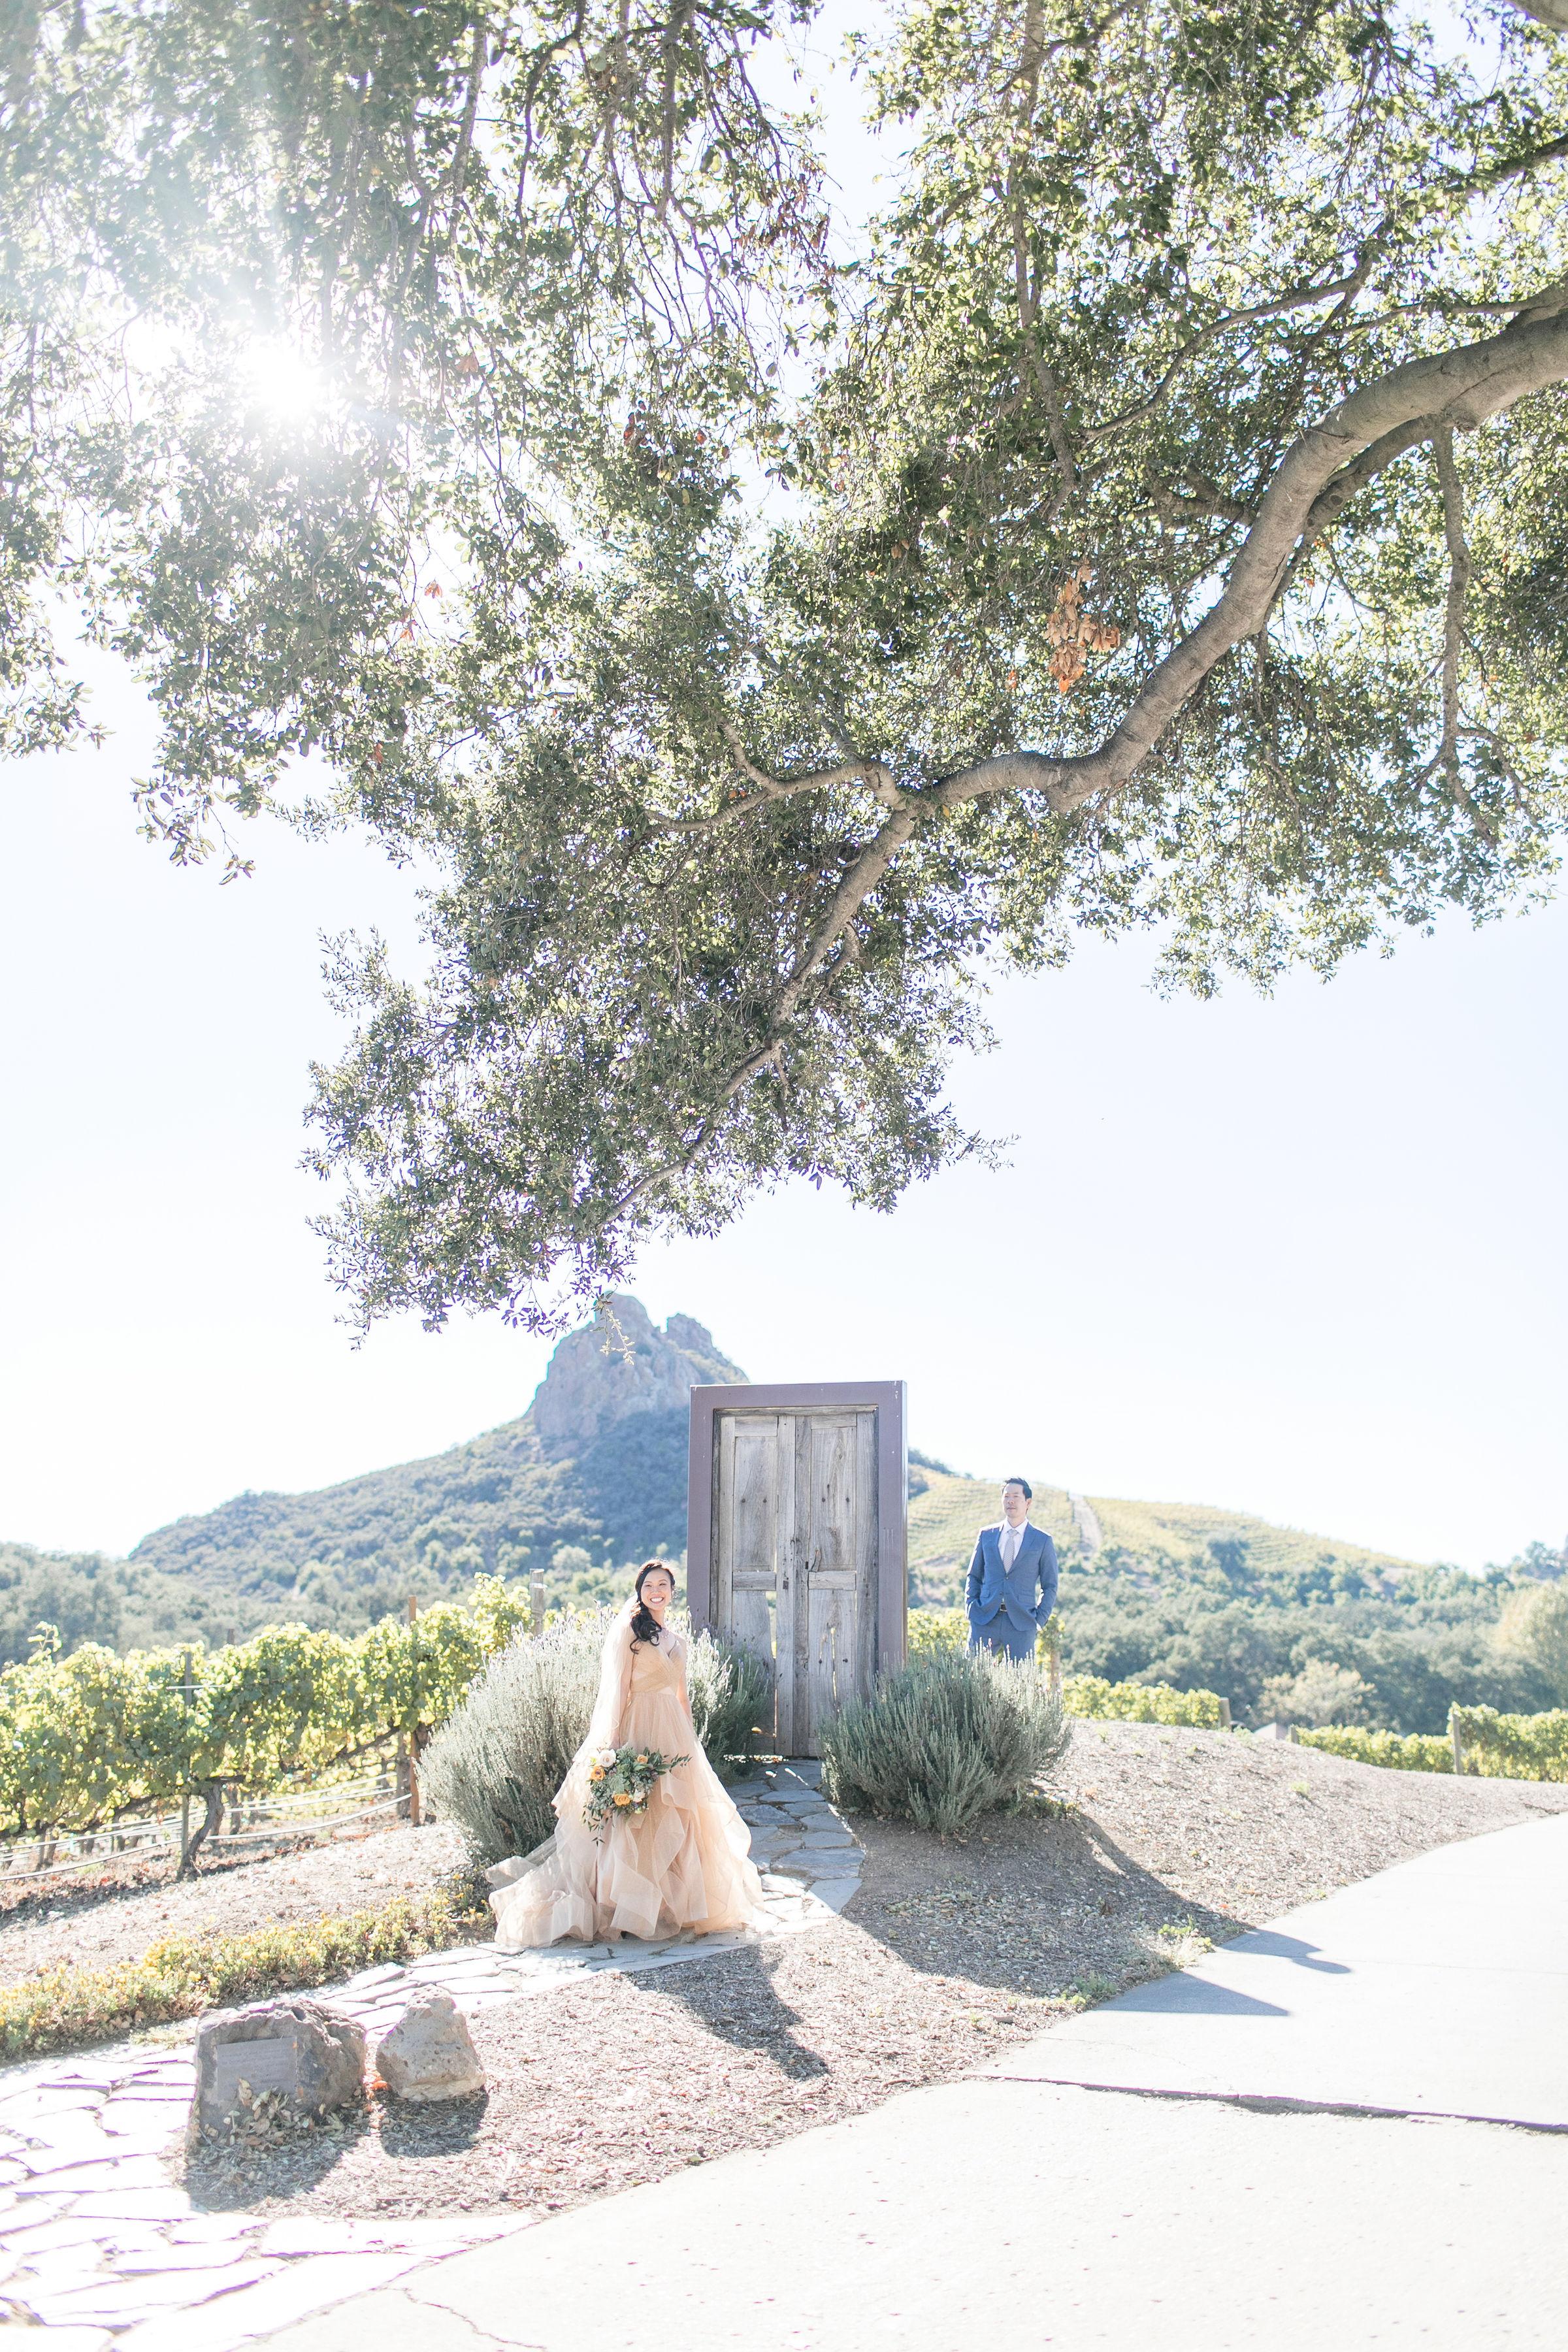 Melanie+Seiji-saddlerockranch-malibucaliforniawedding-couplesportraitsandweddingparty-0234.jpg